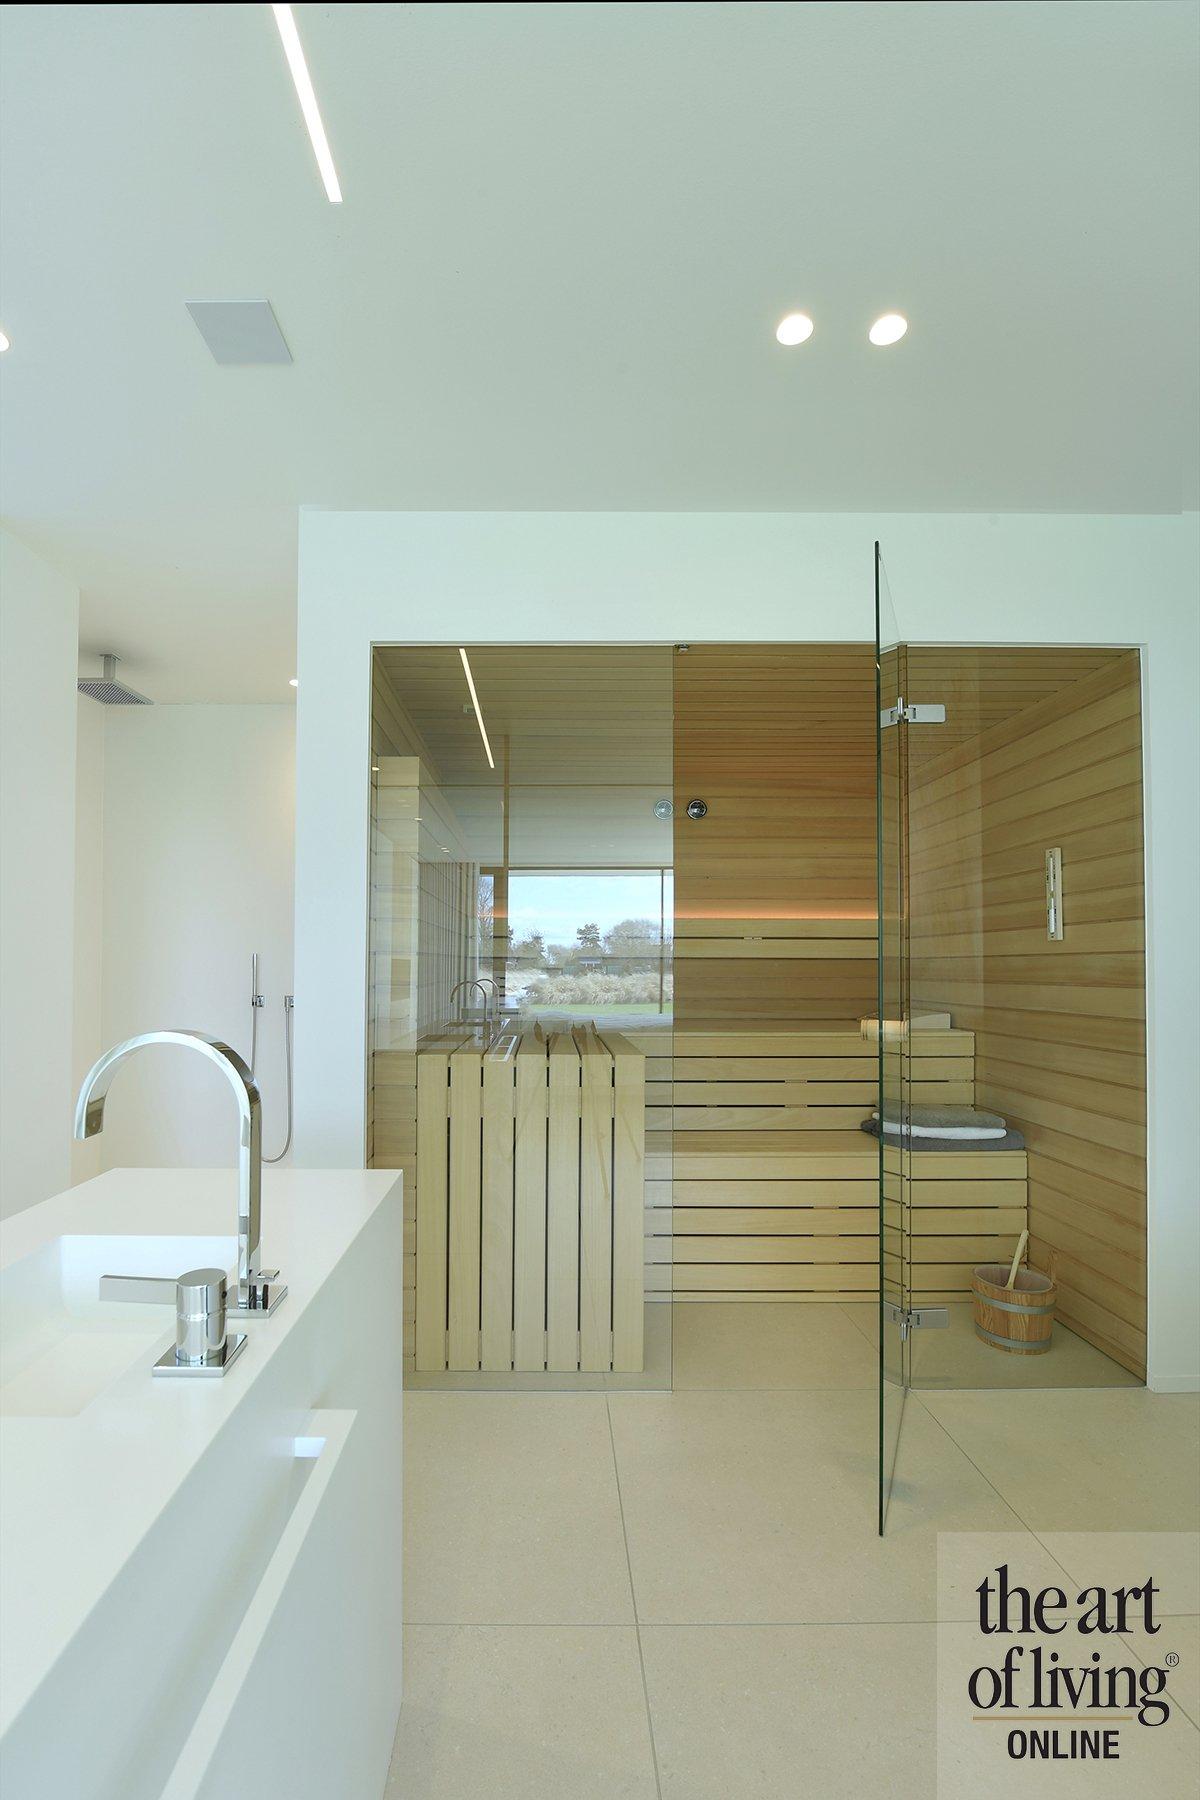 Daglicht | AR Architecten, the art of living